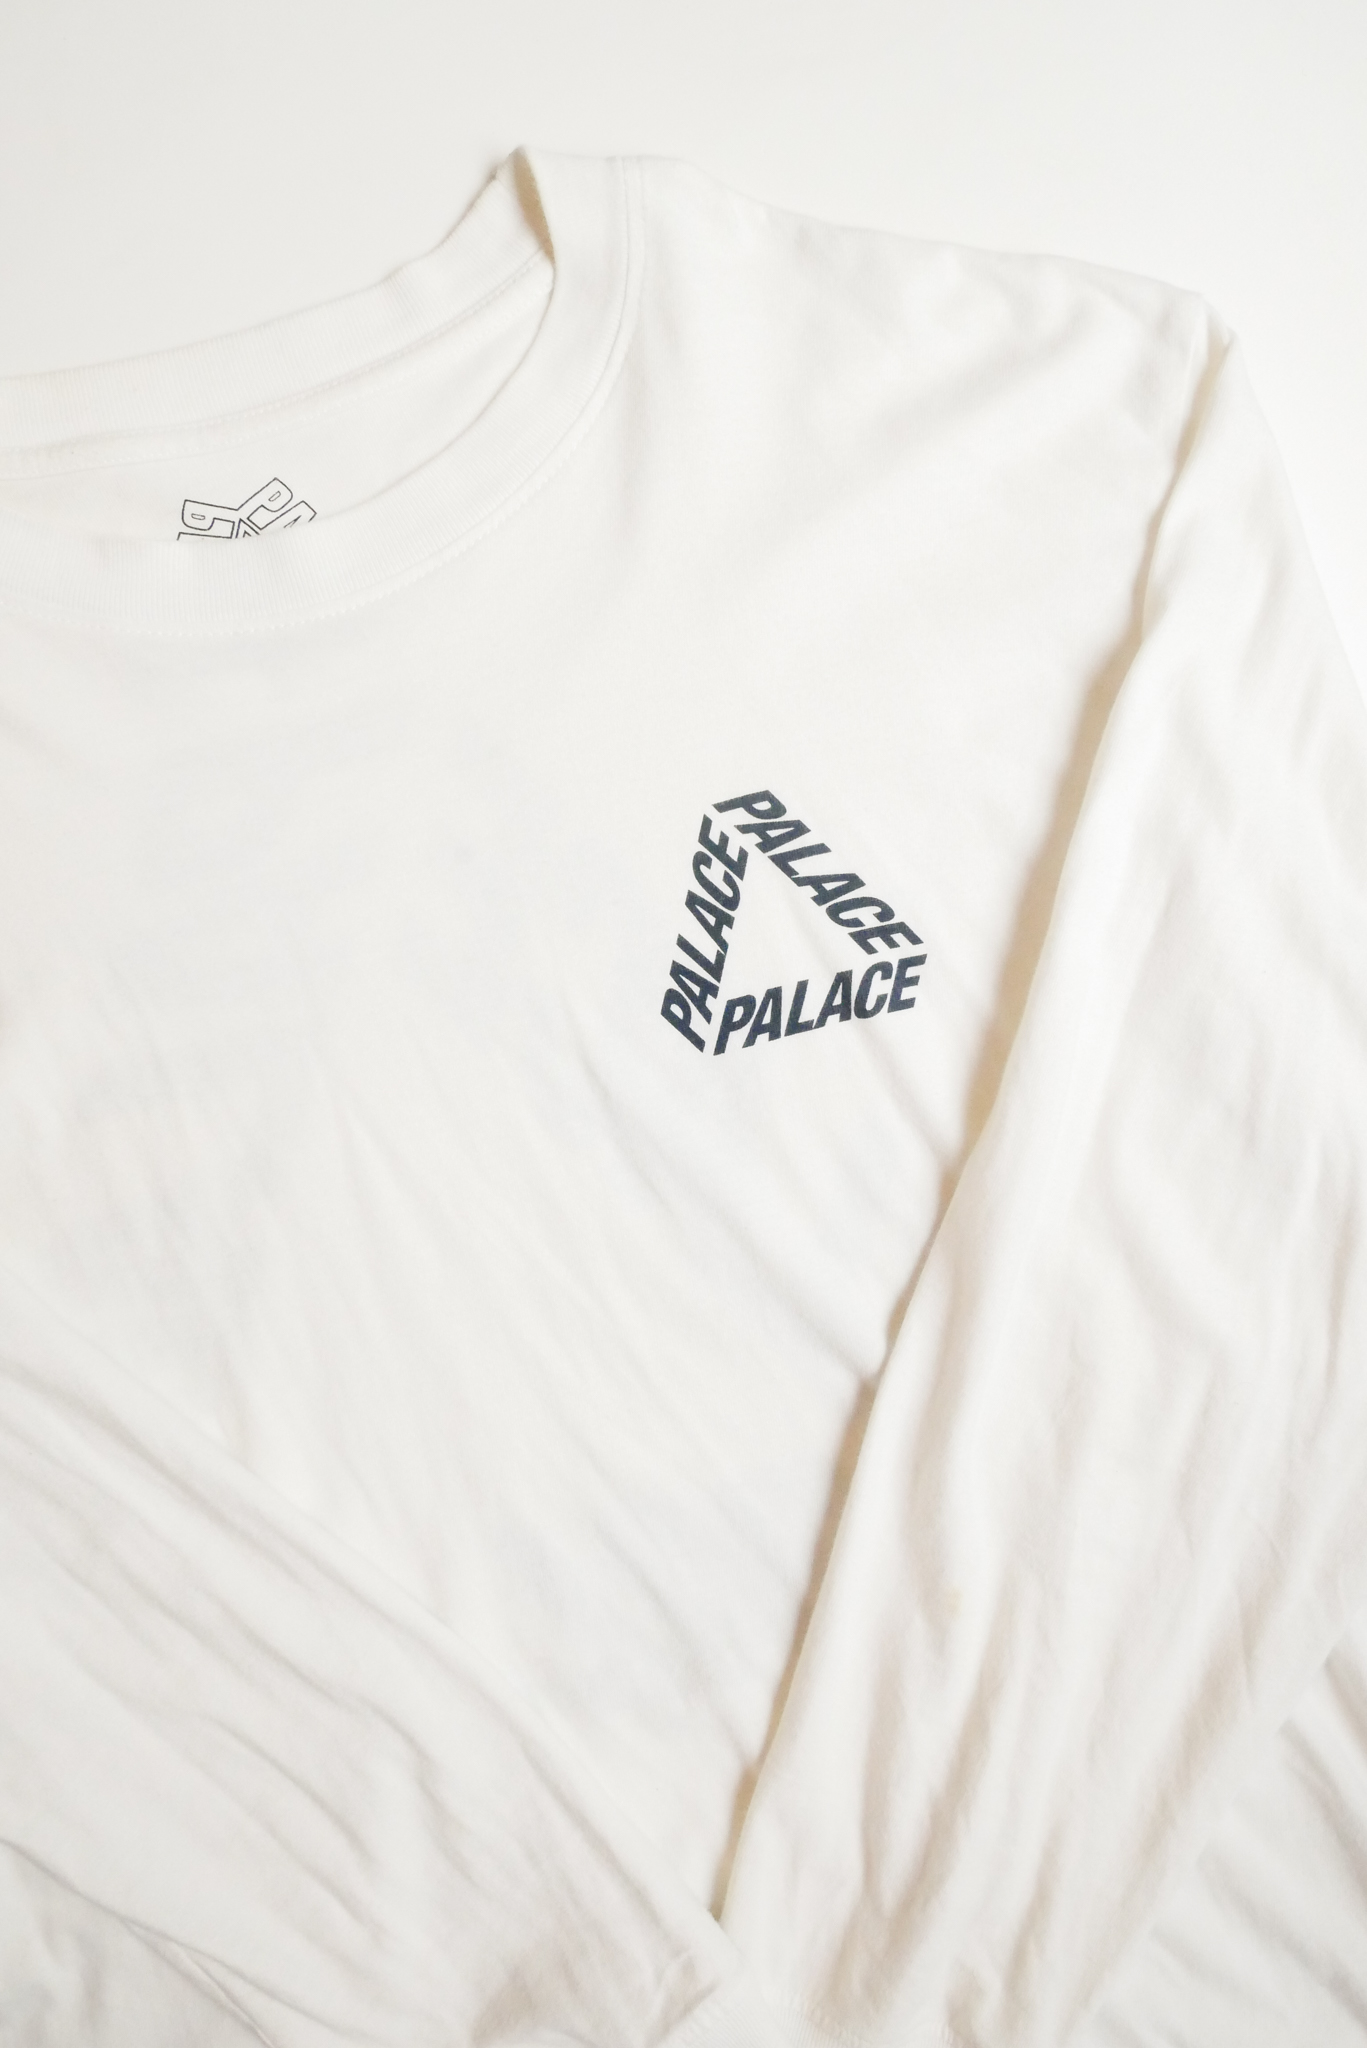 Palace Chest Logo Longsleeve T shirt